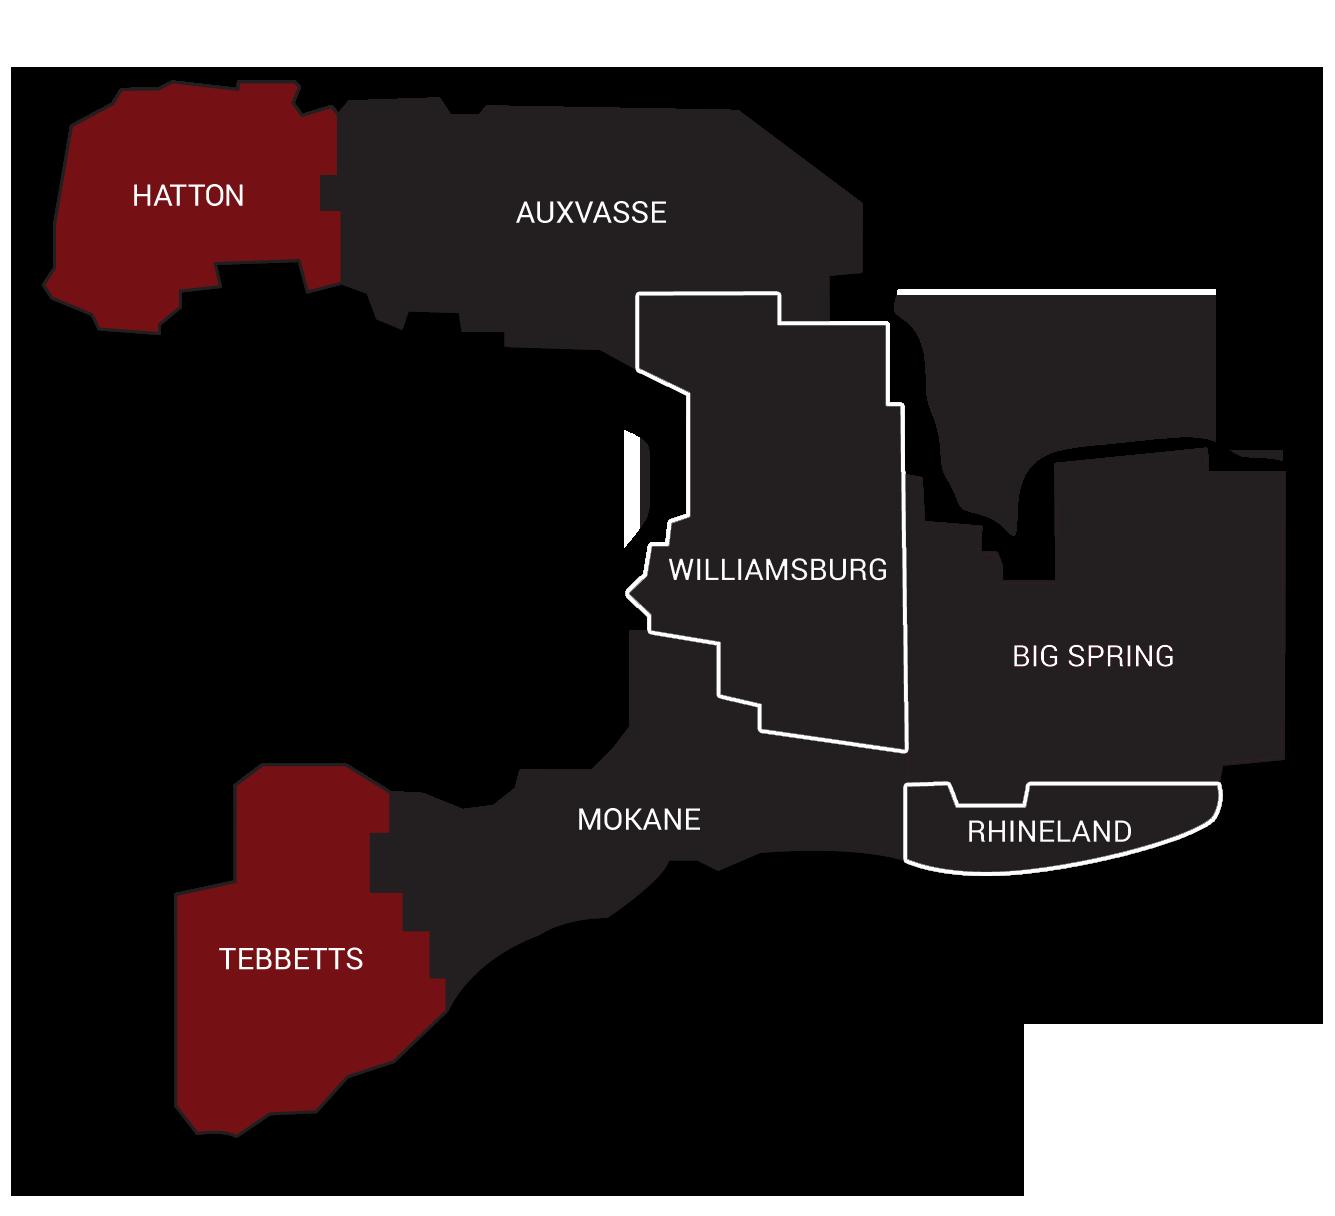 Kingdom Telephone Co. coverage map 2019